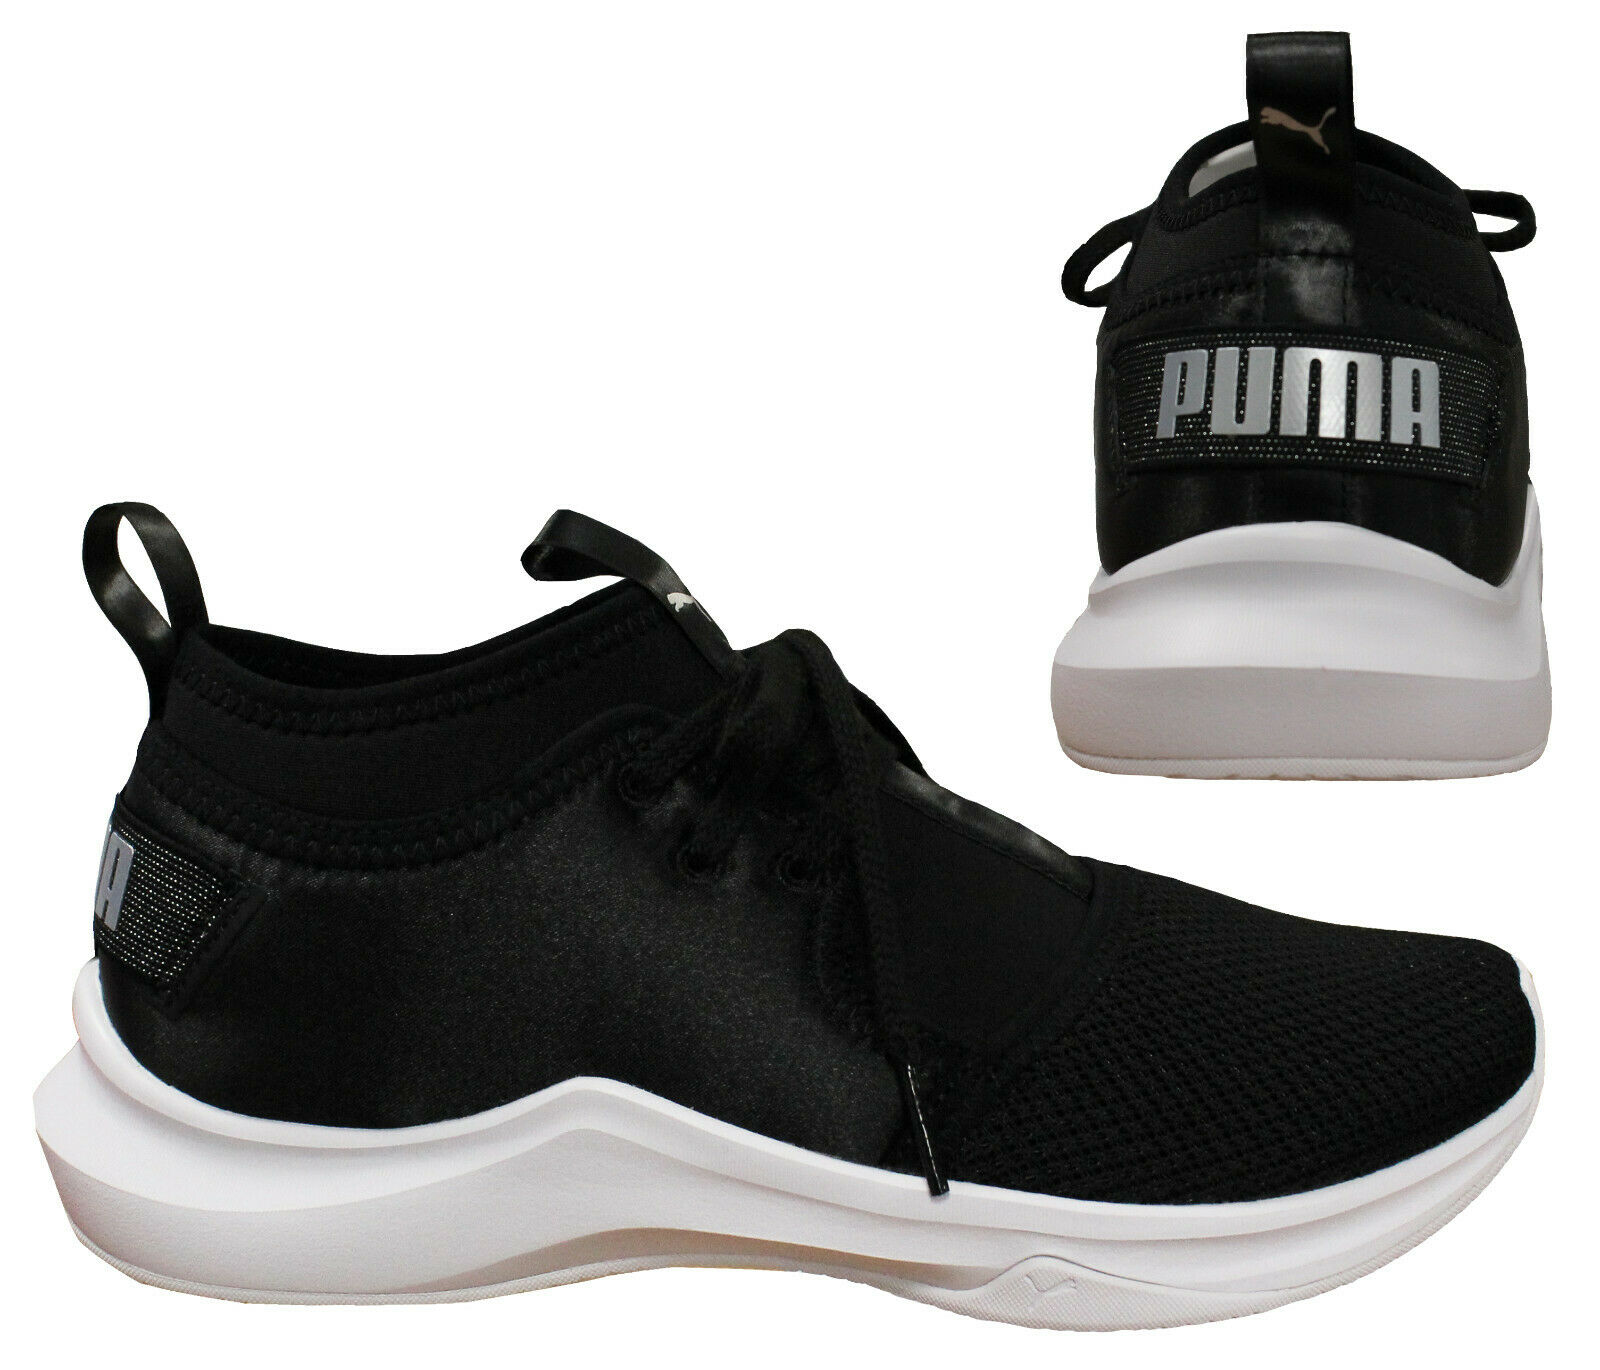 Puma Phenom Bas Satin En Pointe pour femme Baskets Dentelle Noir À Enfiler 190969 01 B2A | eBay